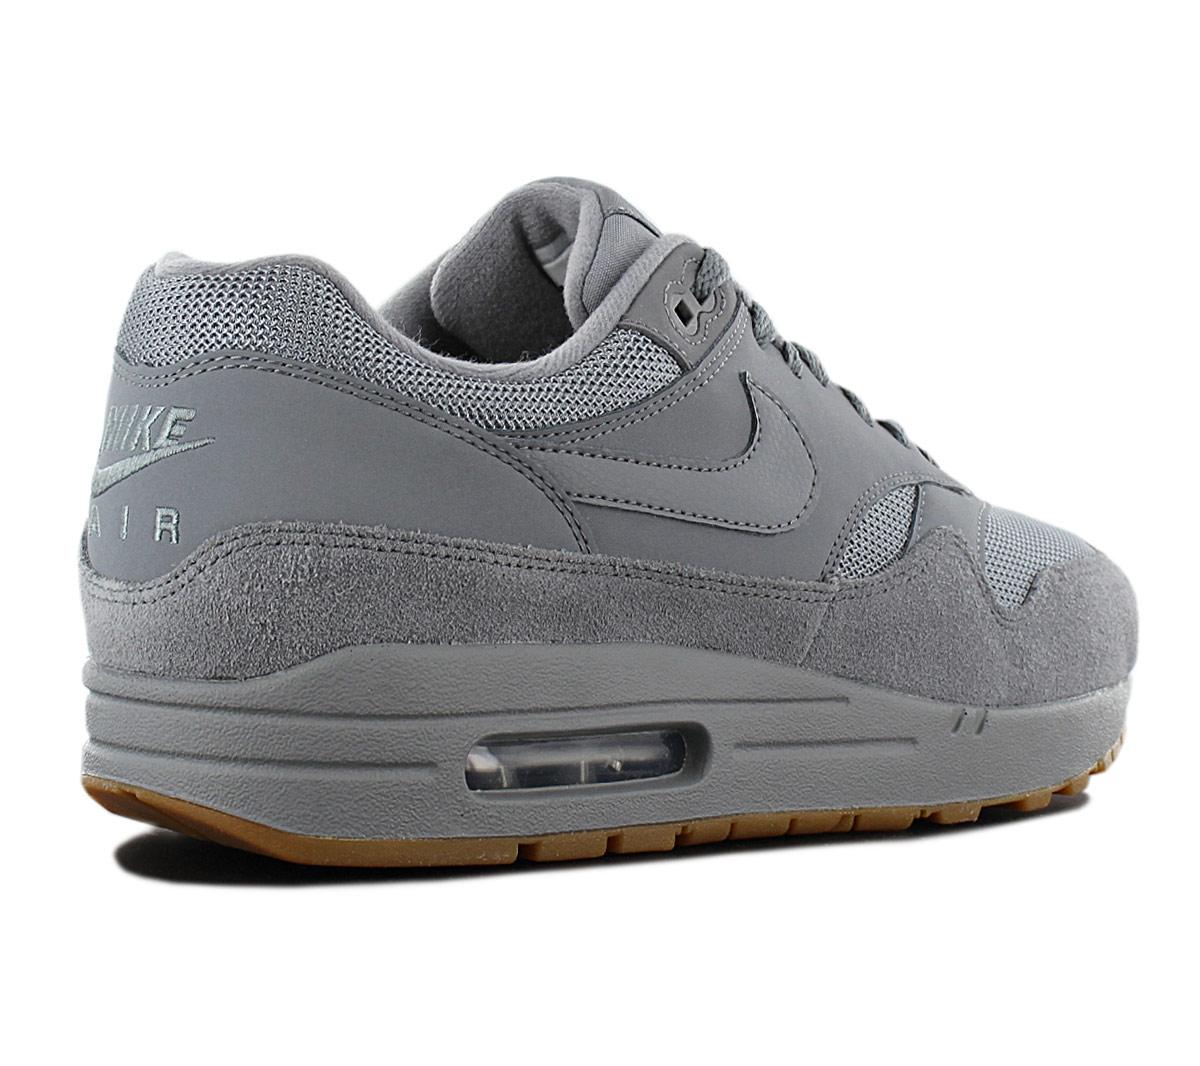 buy popular 51f32 c77f8 Nike Air Max 1 Men s Sneakers Shoes Grey Ah8145-005 Trainers Sport ...